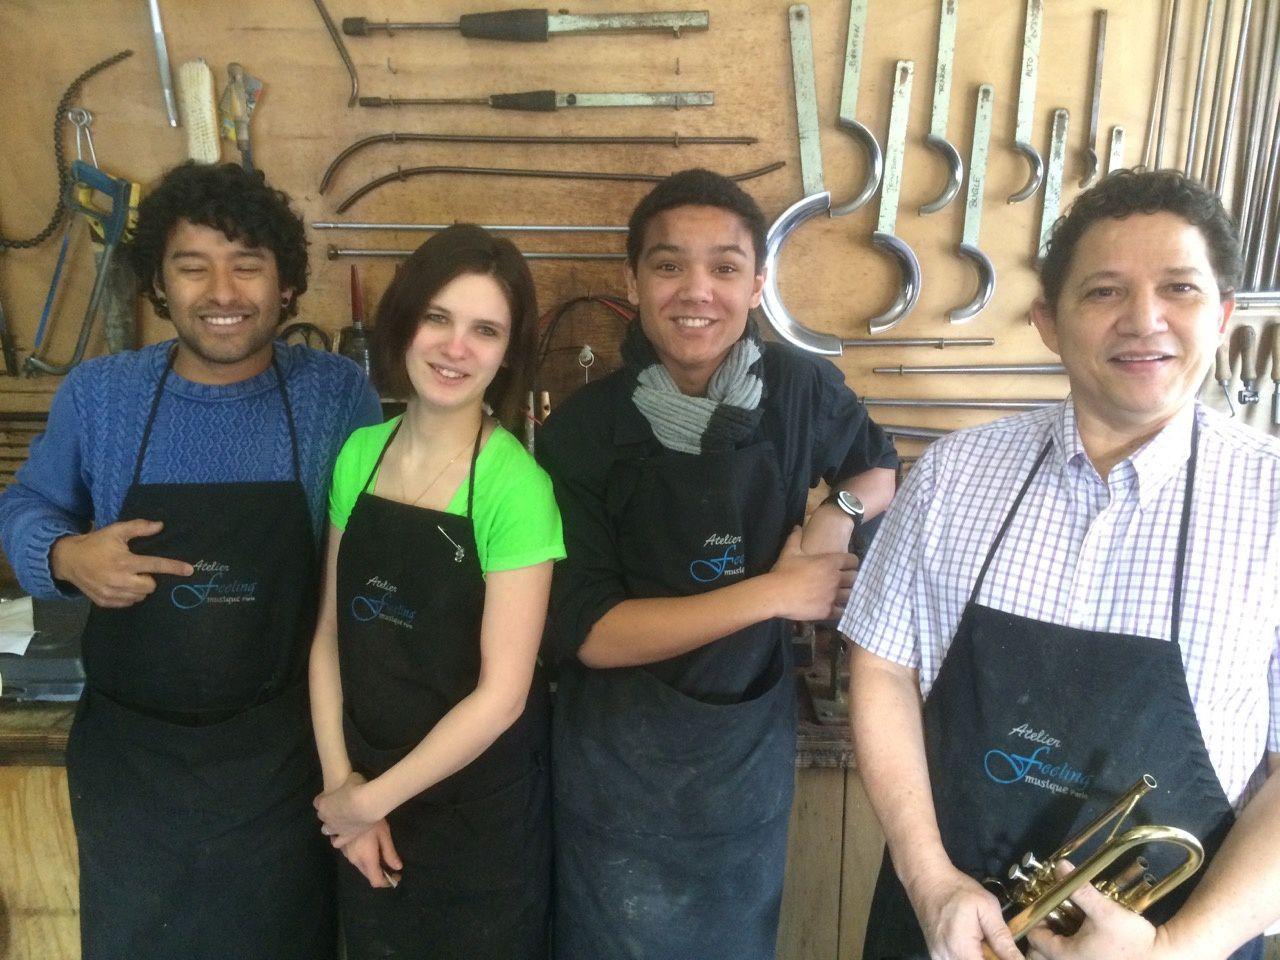 Julian Ortiz, Elodie Andraud, Kylian Maugan, Luis-Edgardo Blanco